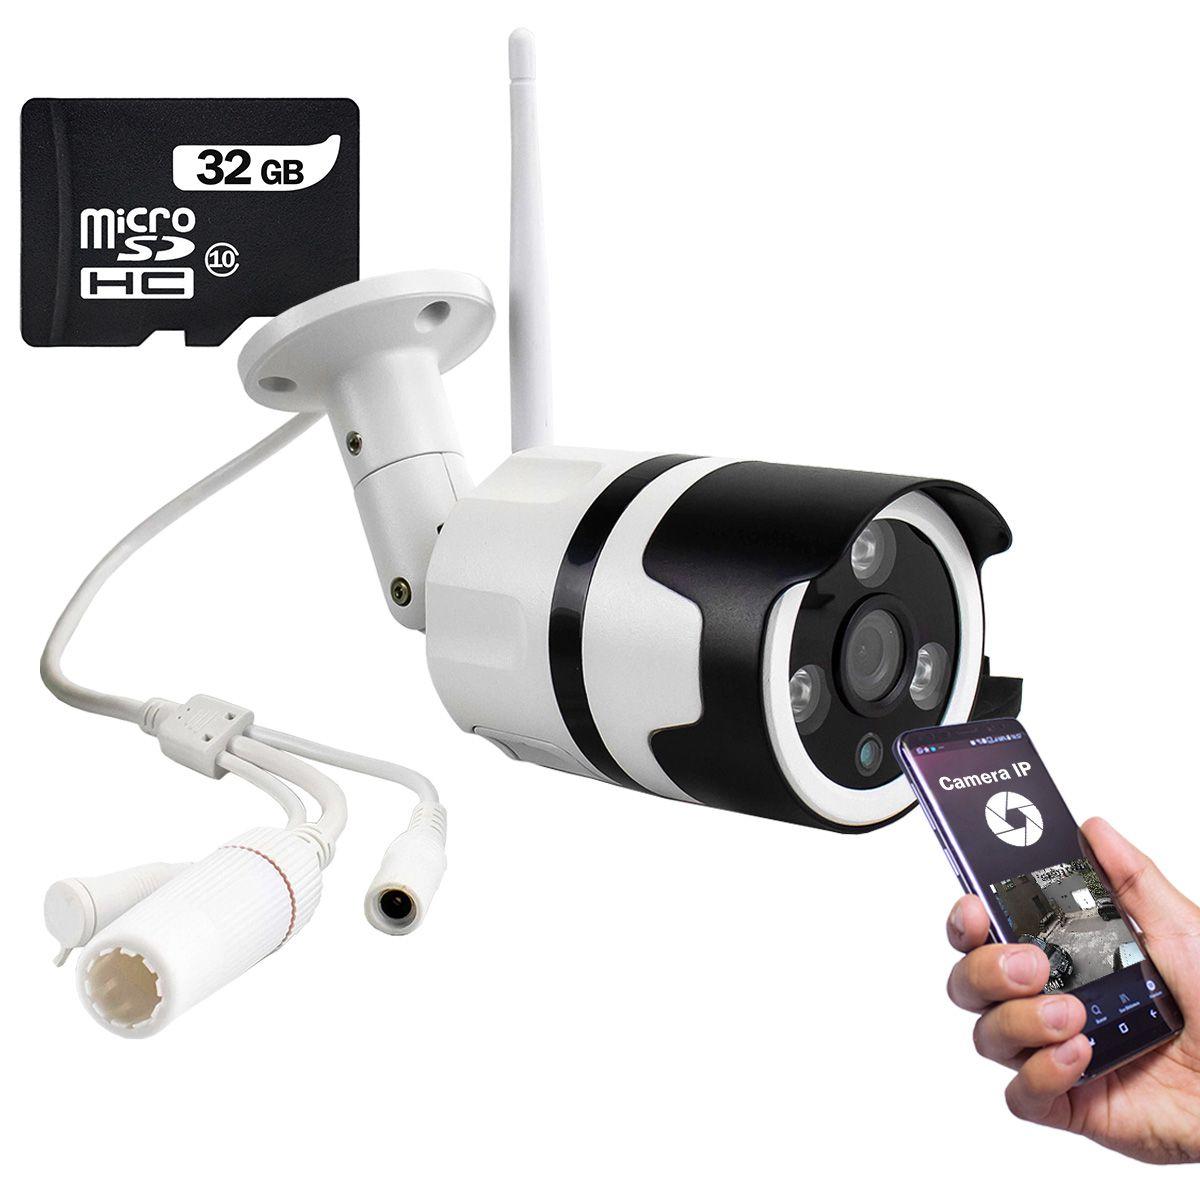 KIT Câmera IP Digital Externa Full HD à Prova D'água com Visão Noturna 1080p XA-N632 + Cartão Micro SD 32GB